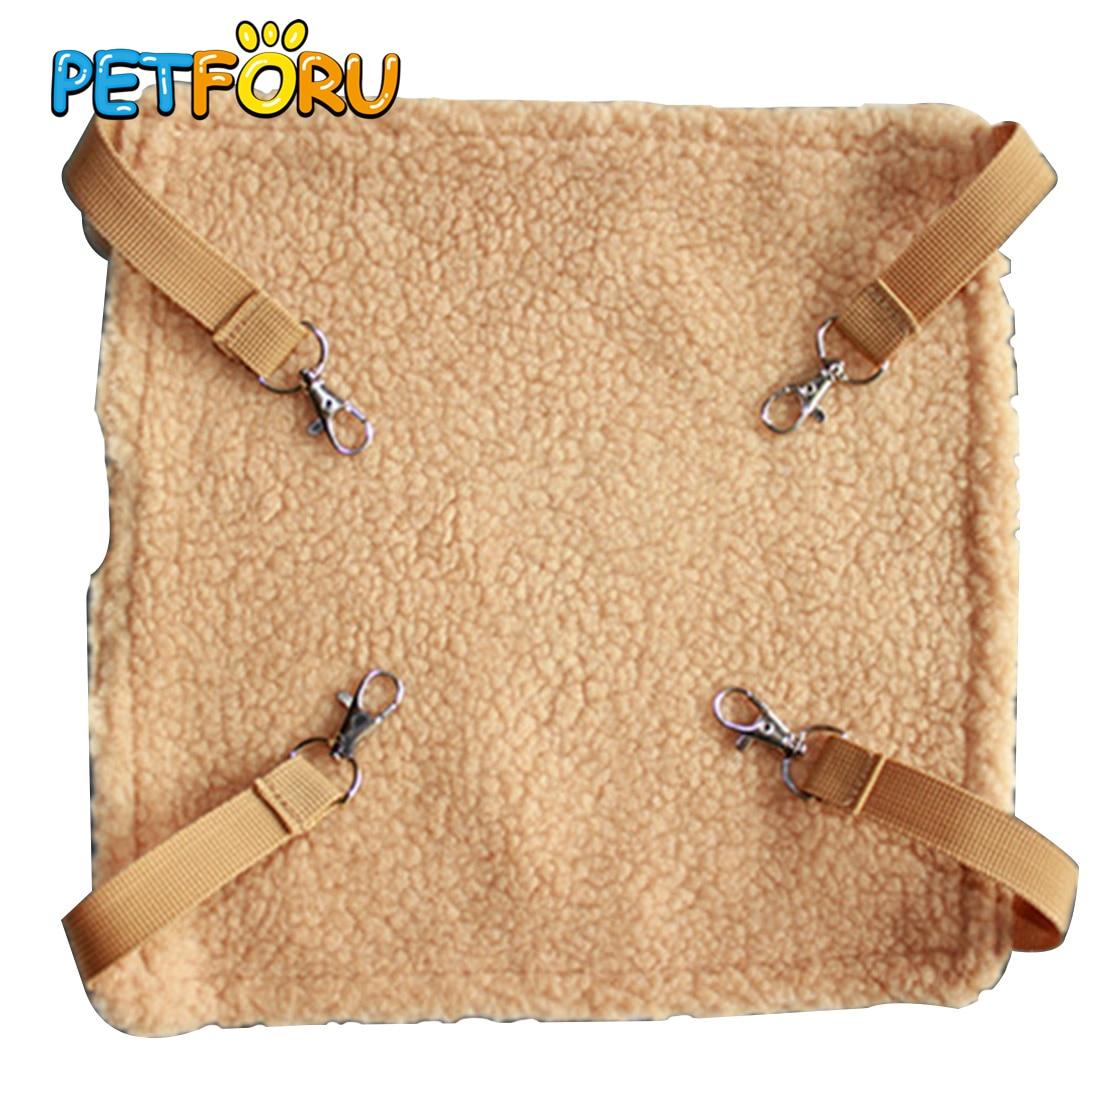 PETFORU 27*27CM Small Animal Pet Hamster Hammock Hanging Bed Cage - XS